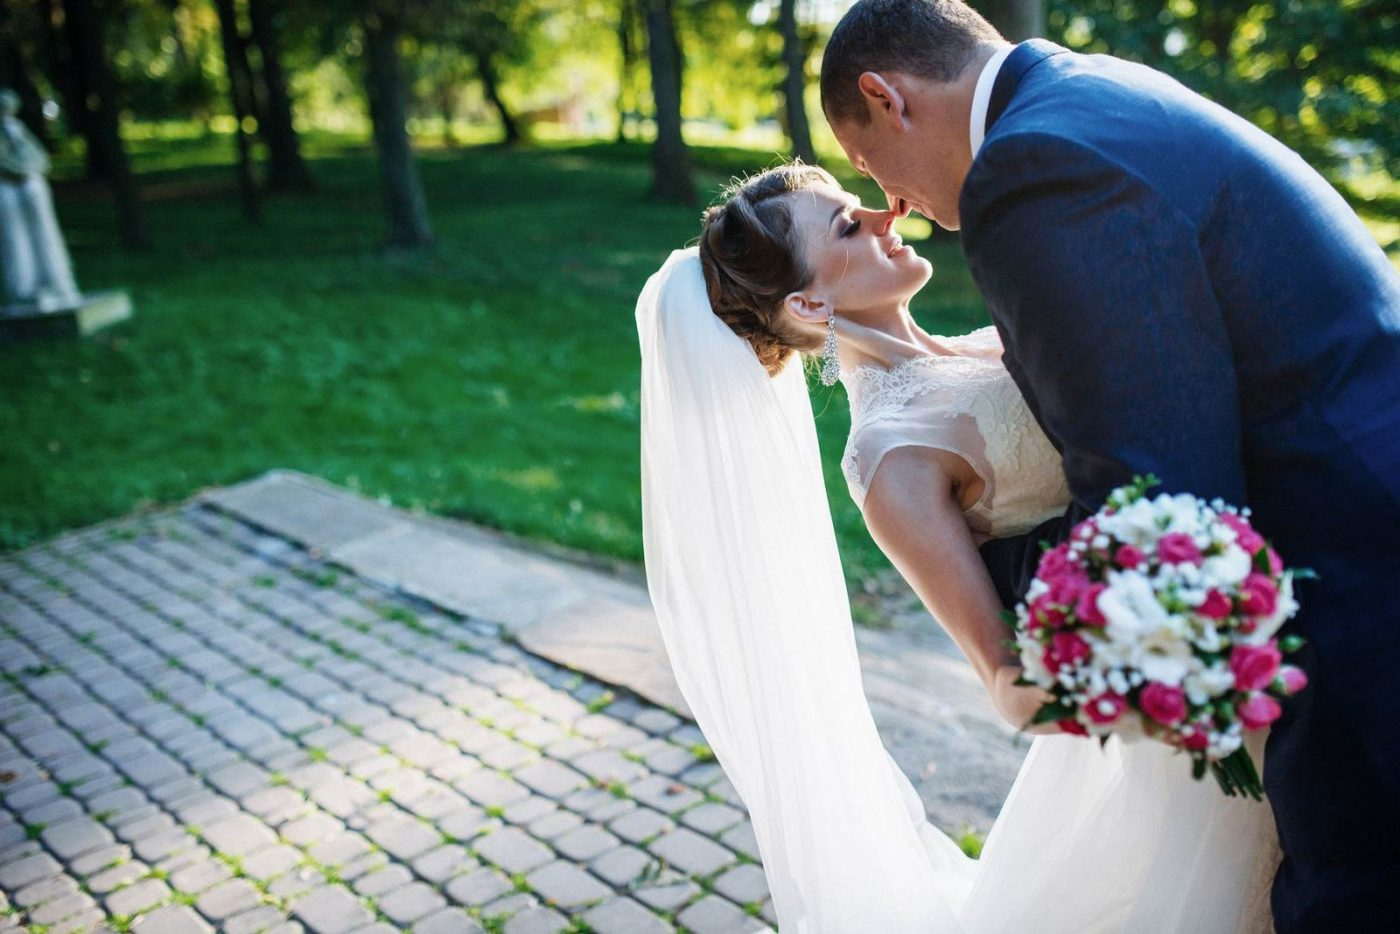 Raleigh wedding videographers